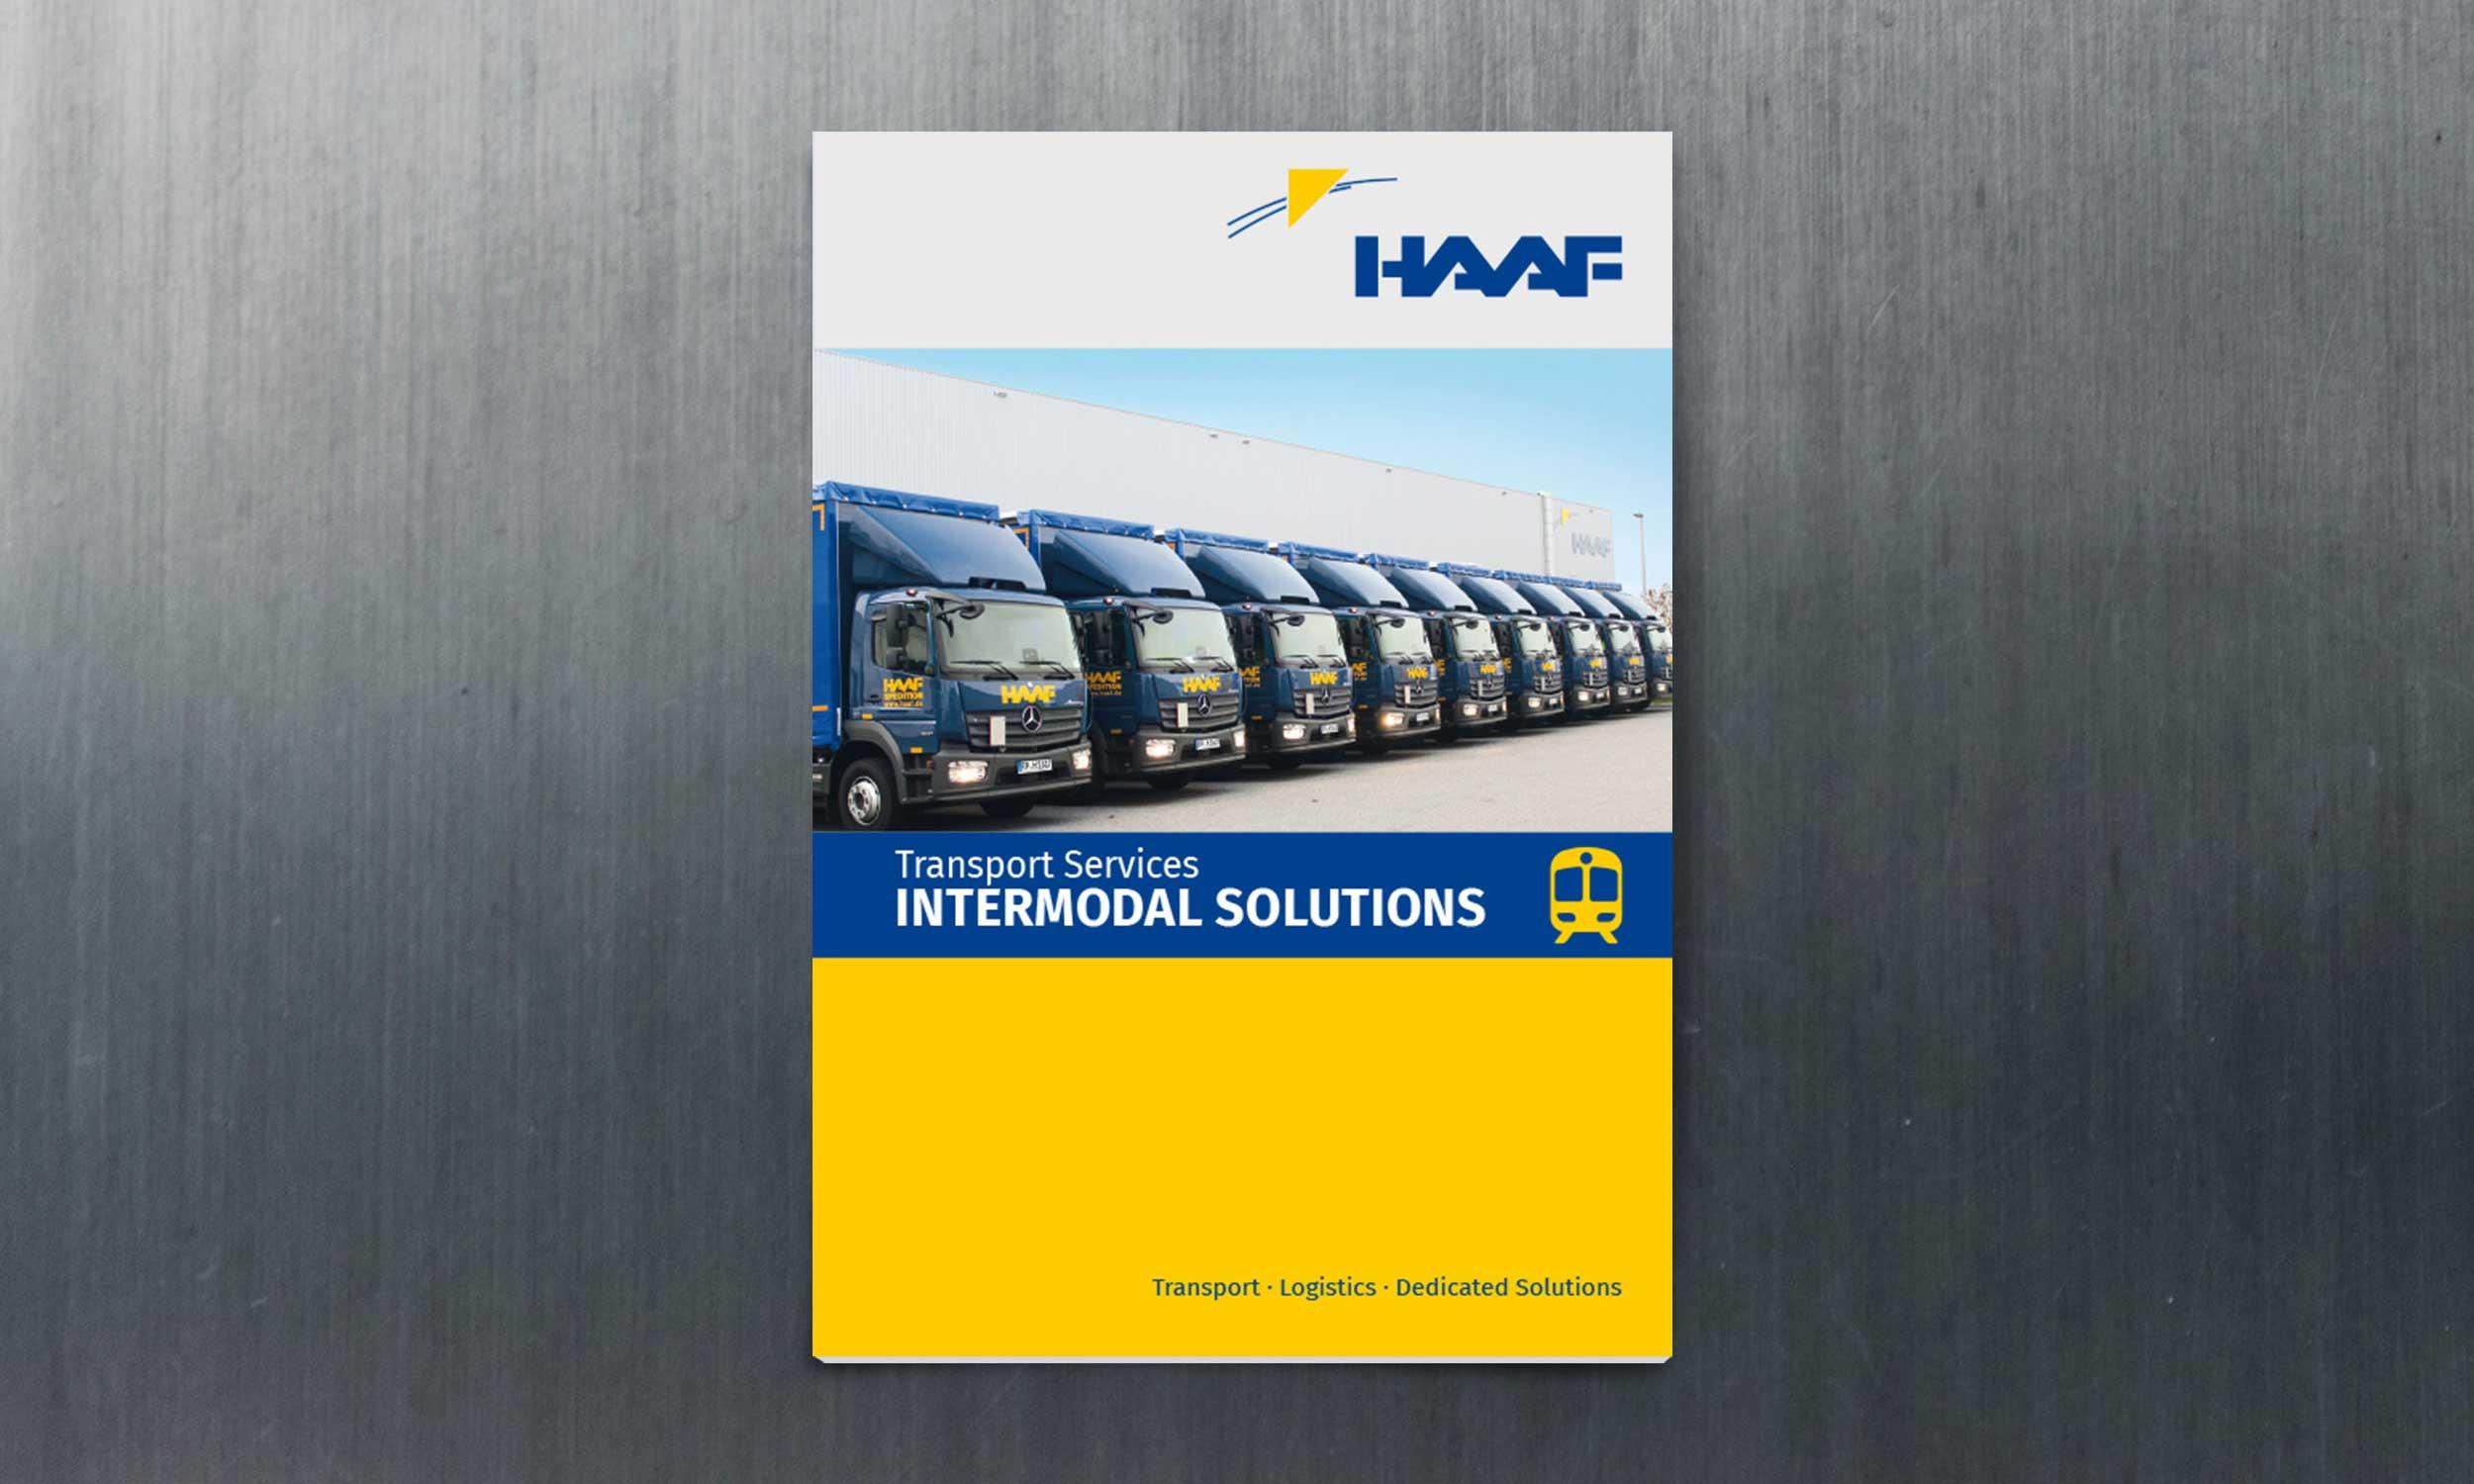 Spedition Haaf – Intermodal Solutions |Design